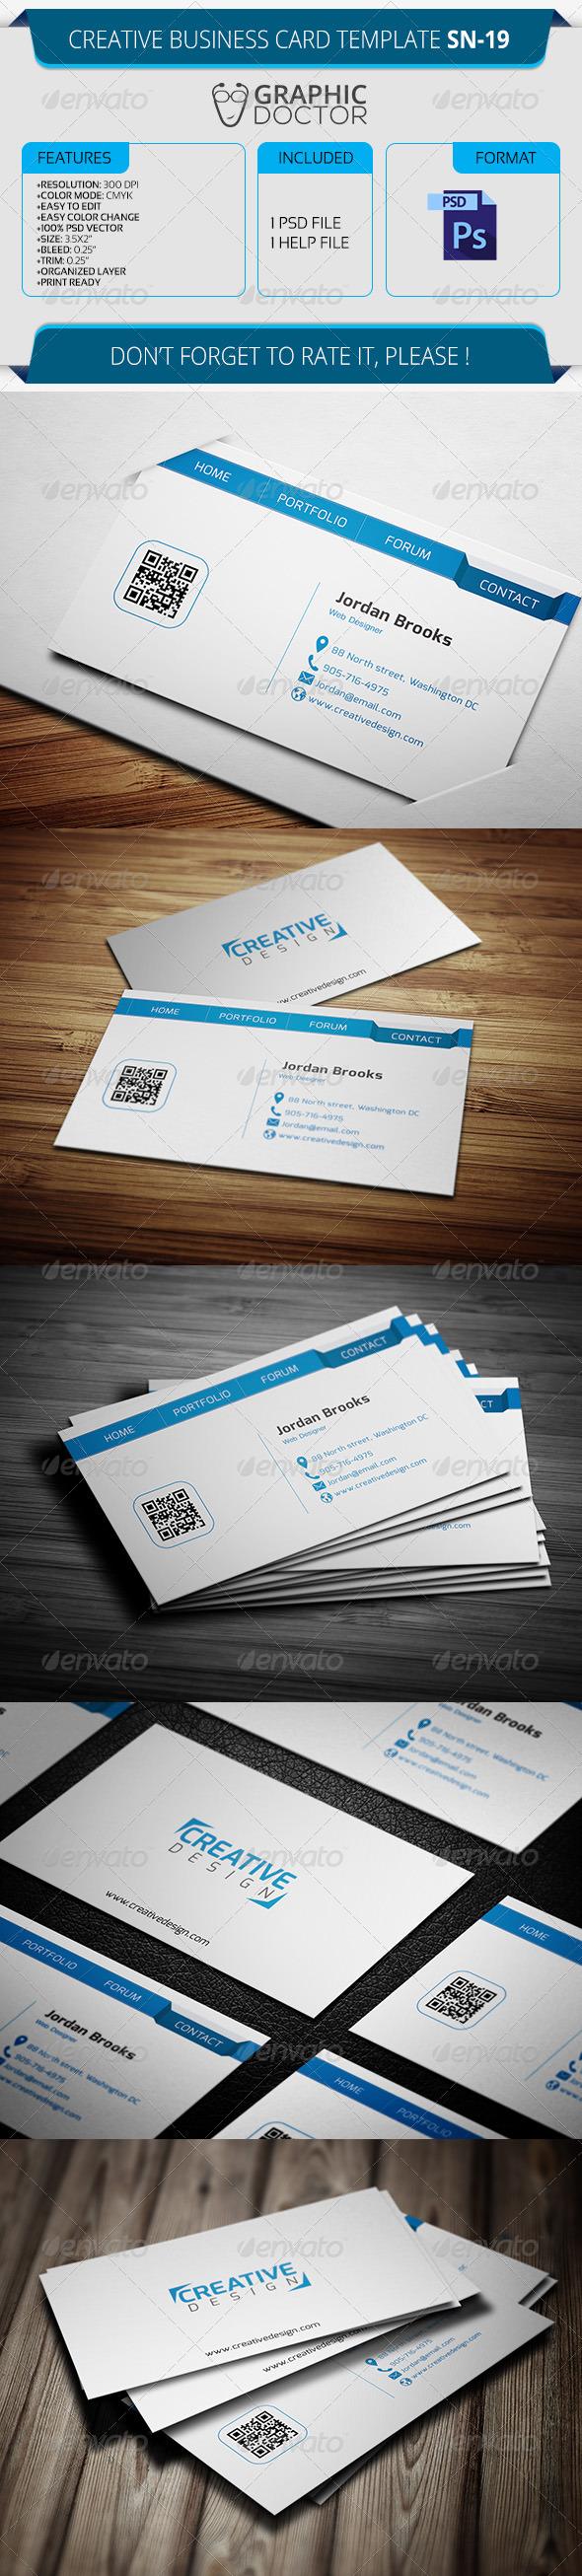 Creative Business Card Template SN-19 - Creative Business Cards